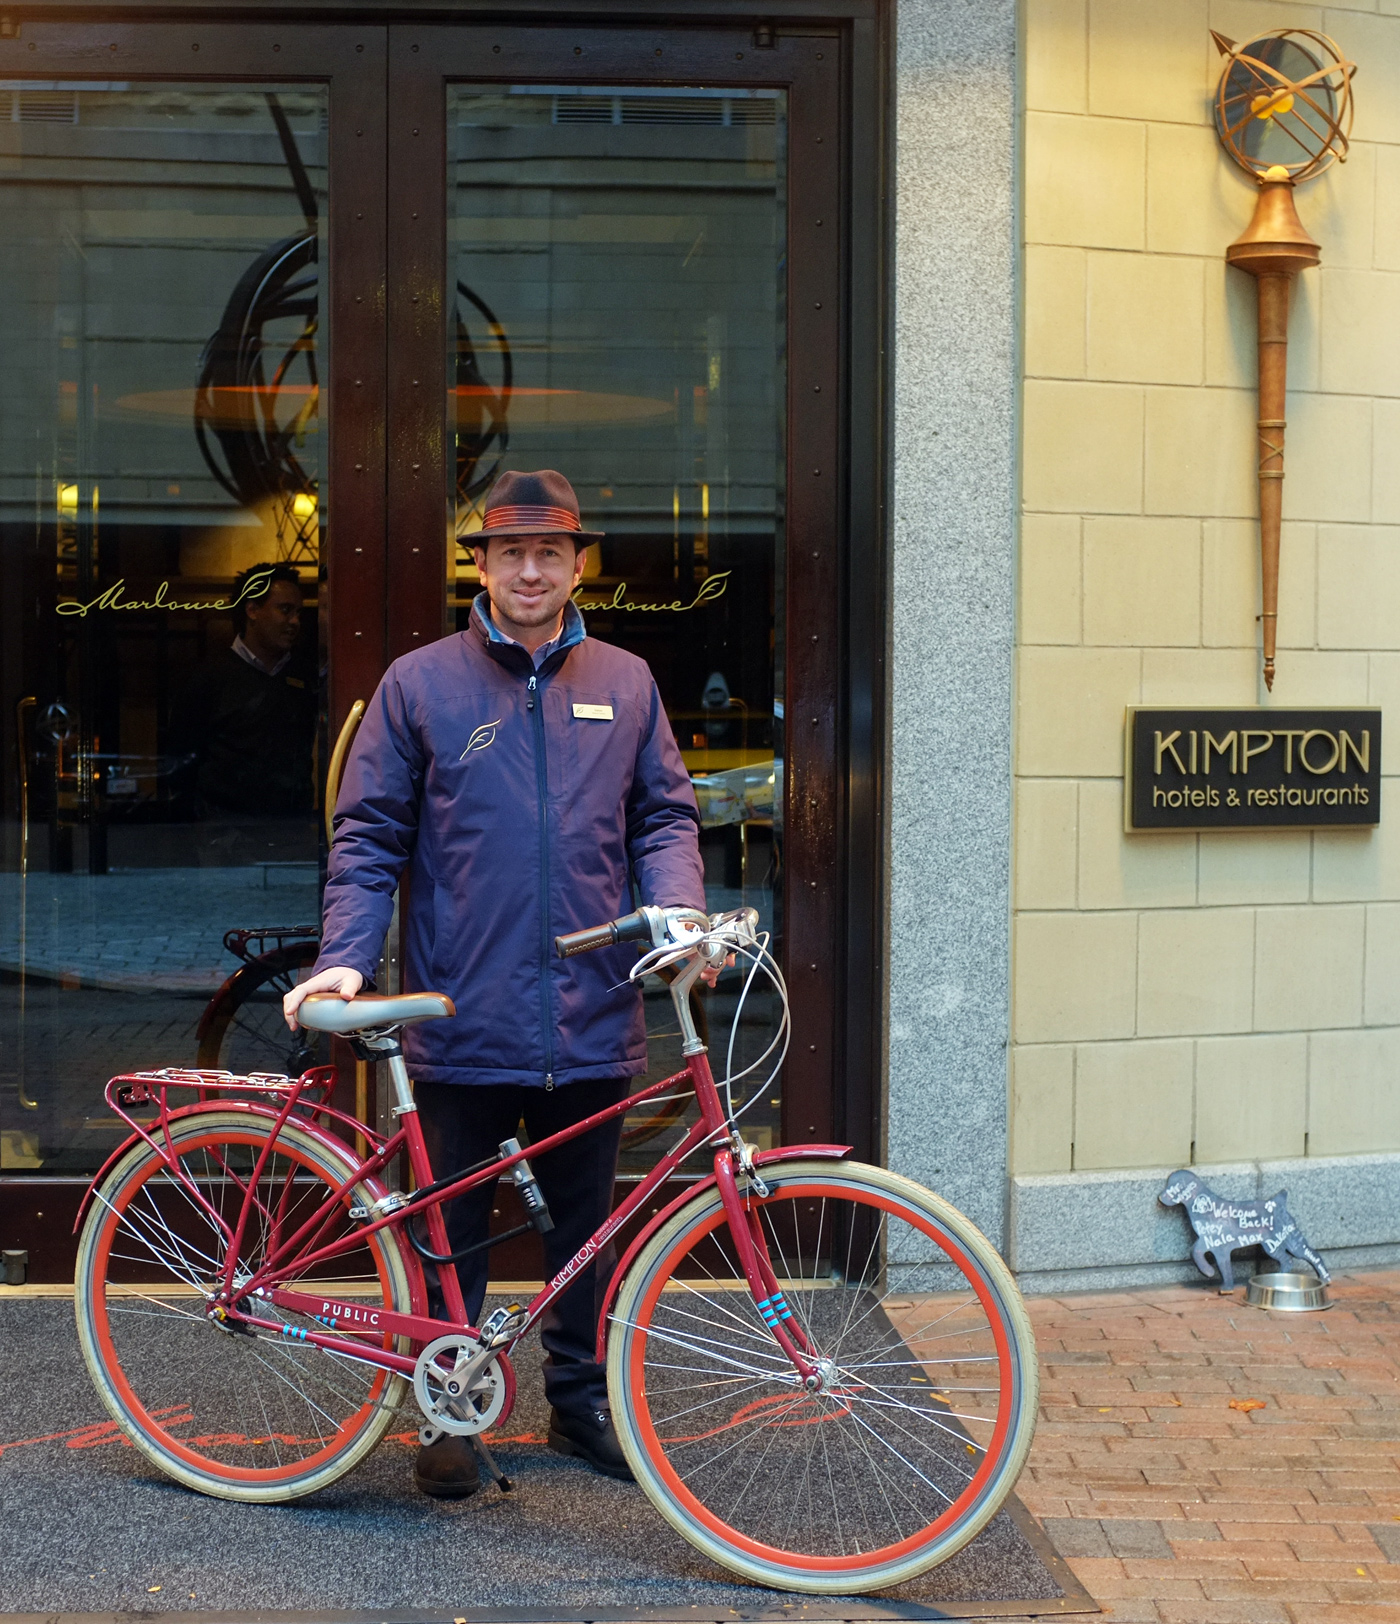 Bikabout-Kimpton-Hotel-Marlowe-bicycles.jpg